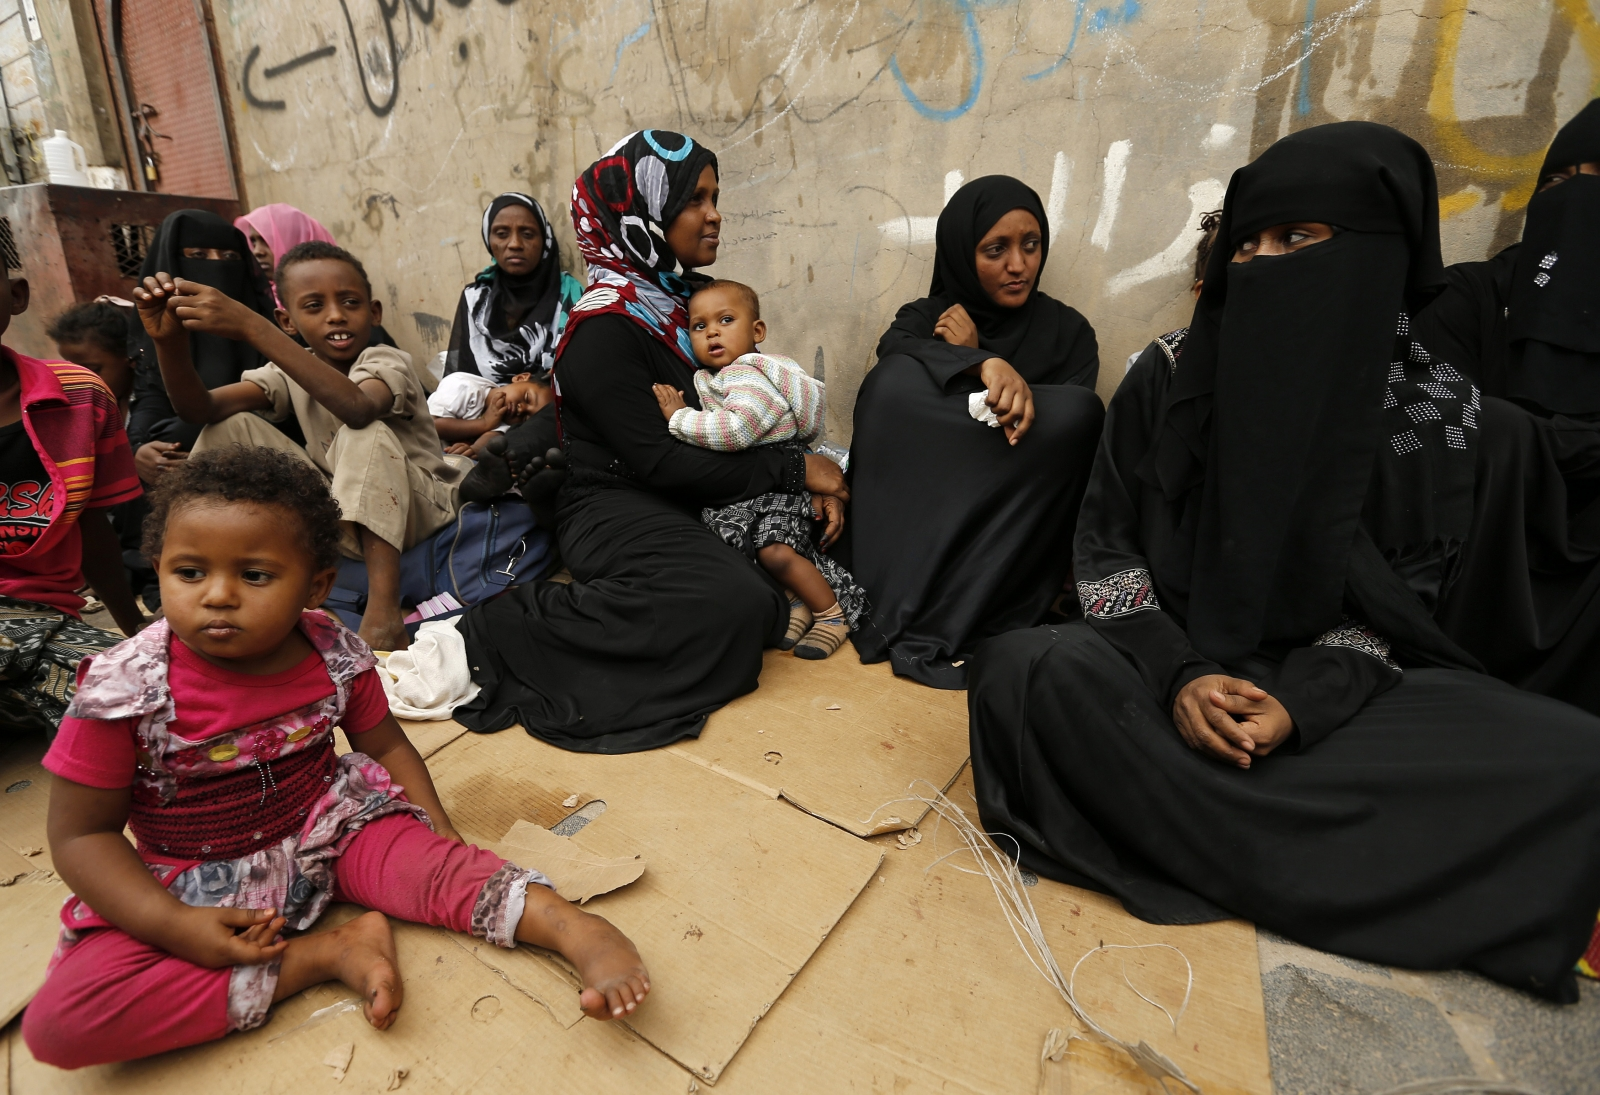 Eritrean asylum seekers Yemen